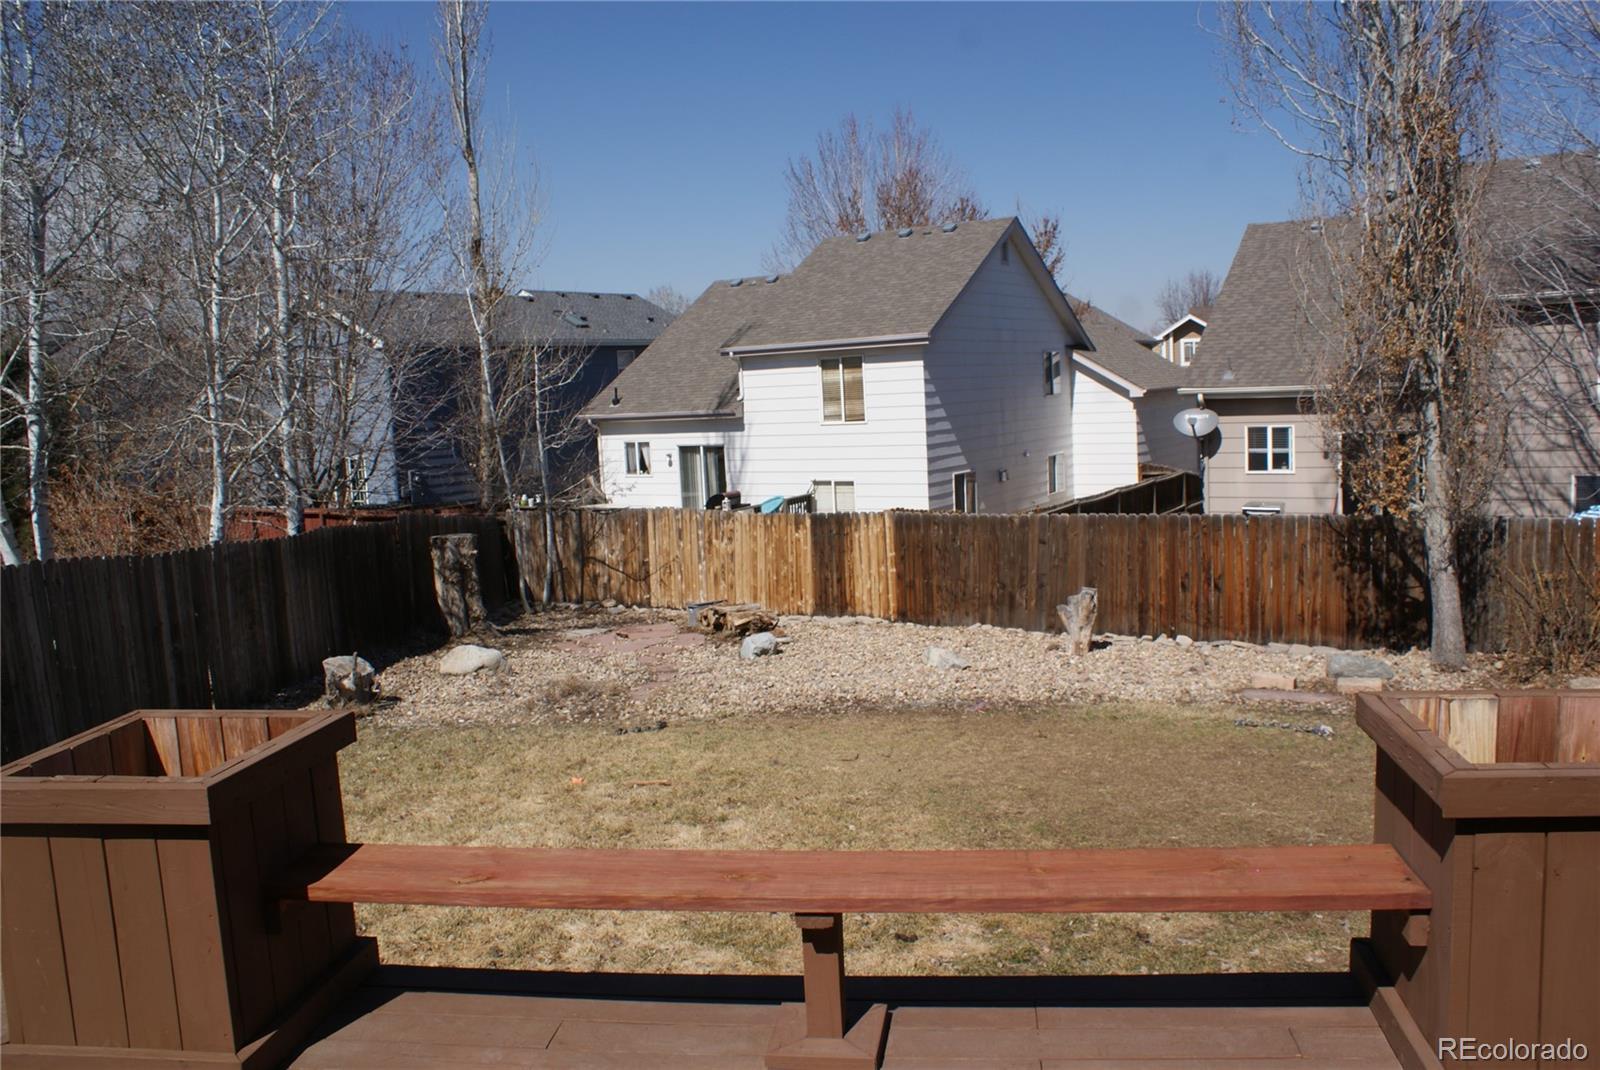 MLS# 4239148 - 17 - 6835 Quigley Circle, Firestone, CO 80504